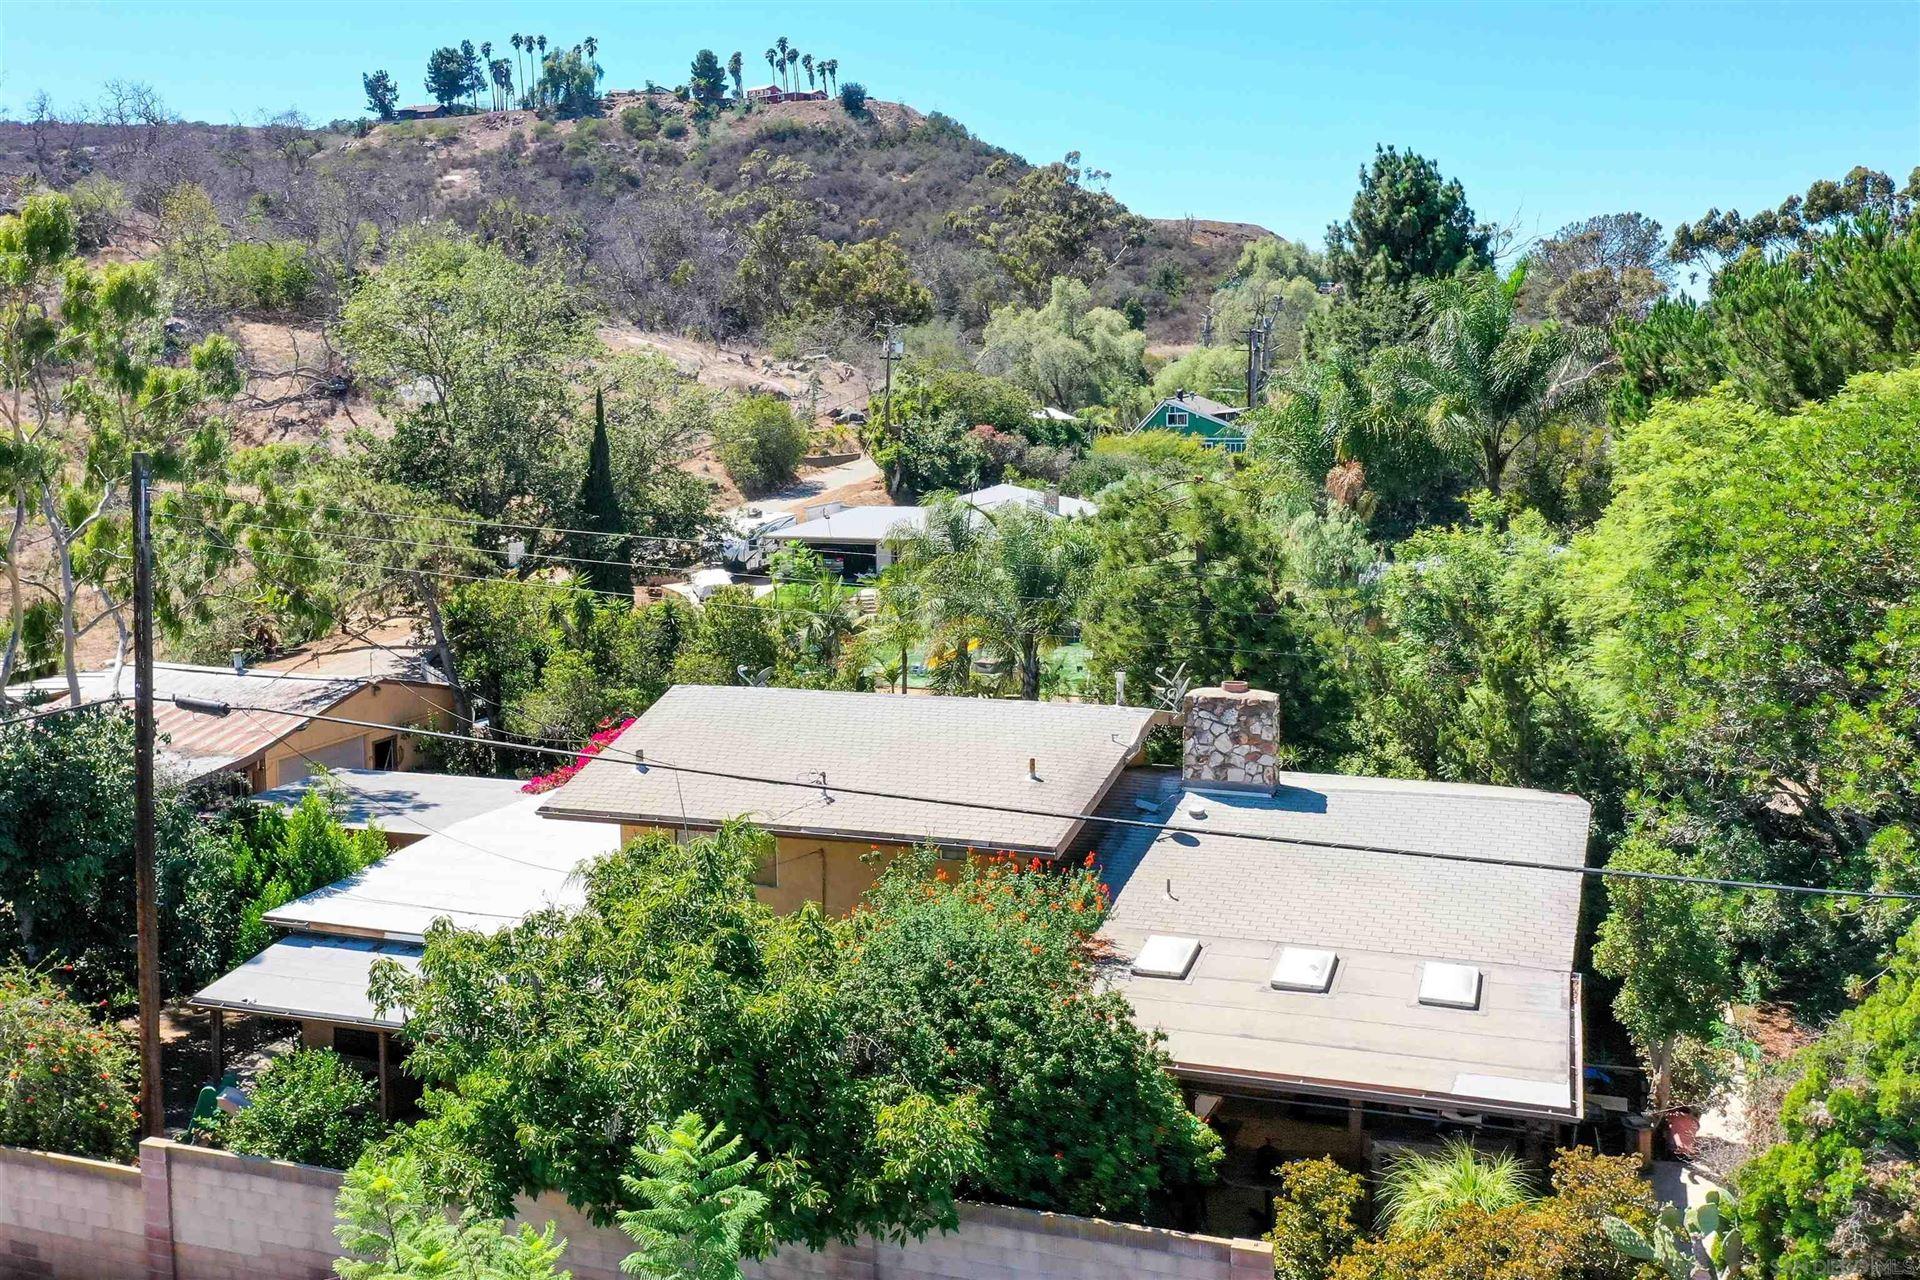 Photo of 1131 LA Moree, San Marcos, CA 92078 (MLS # 210026274)